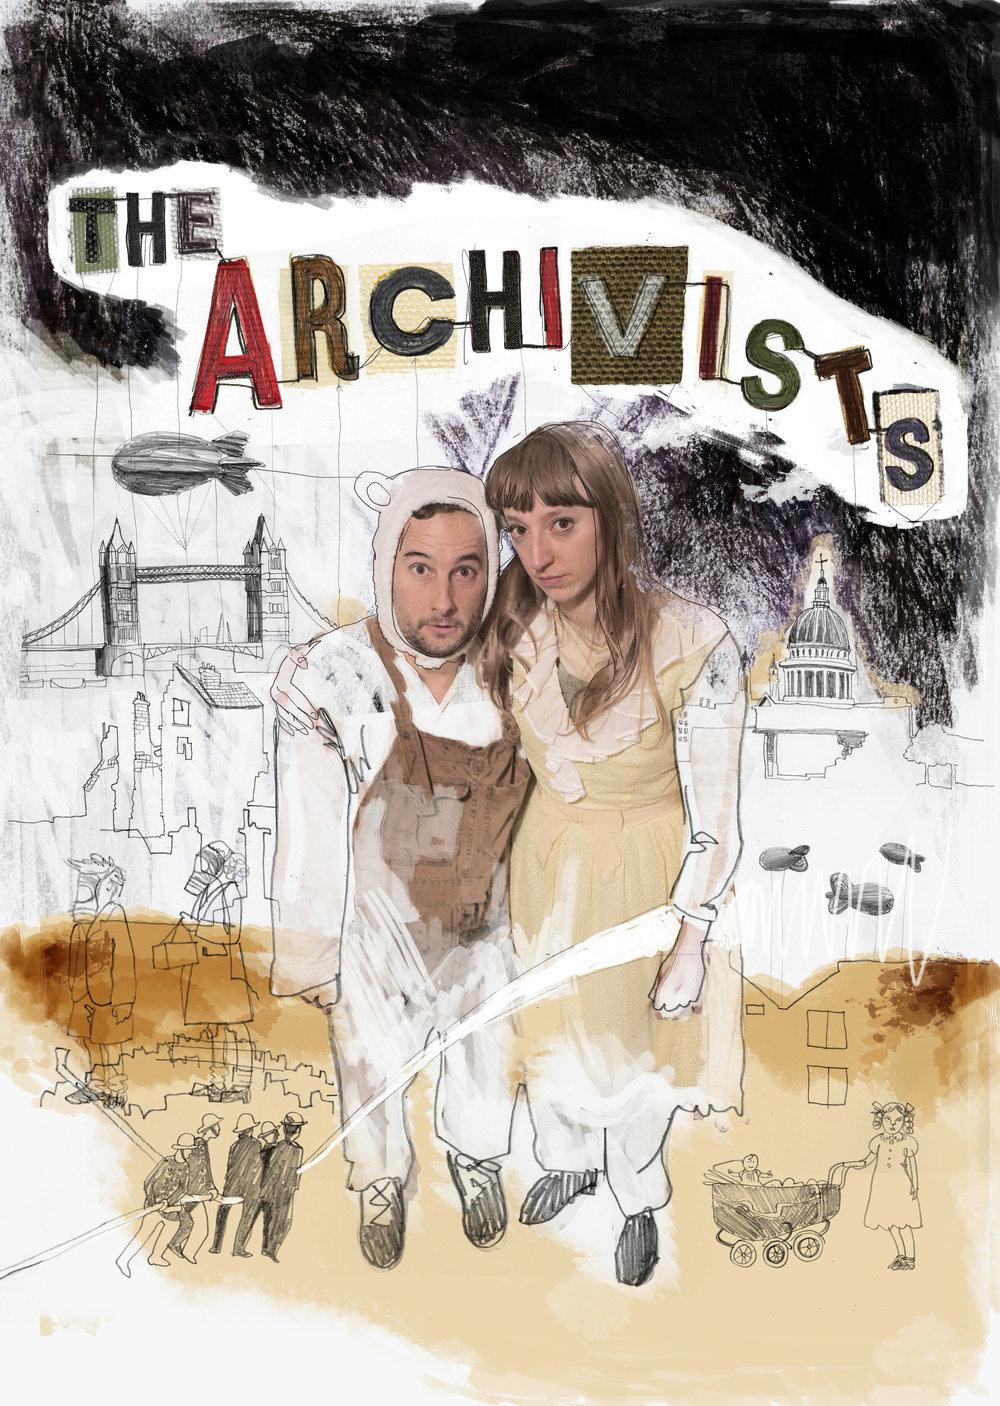 Archivists Main image.jpg